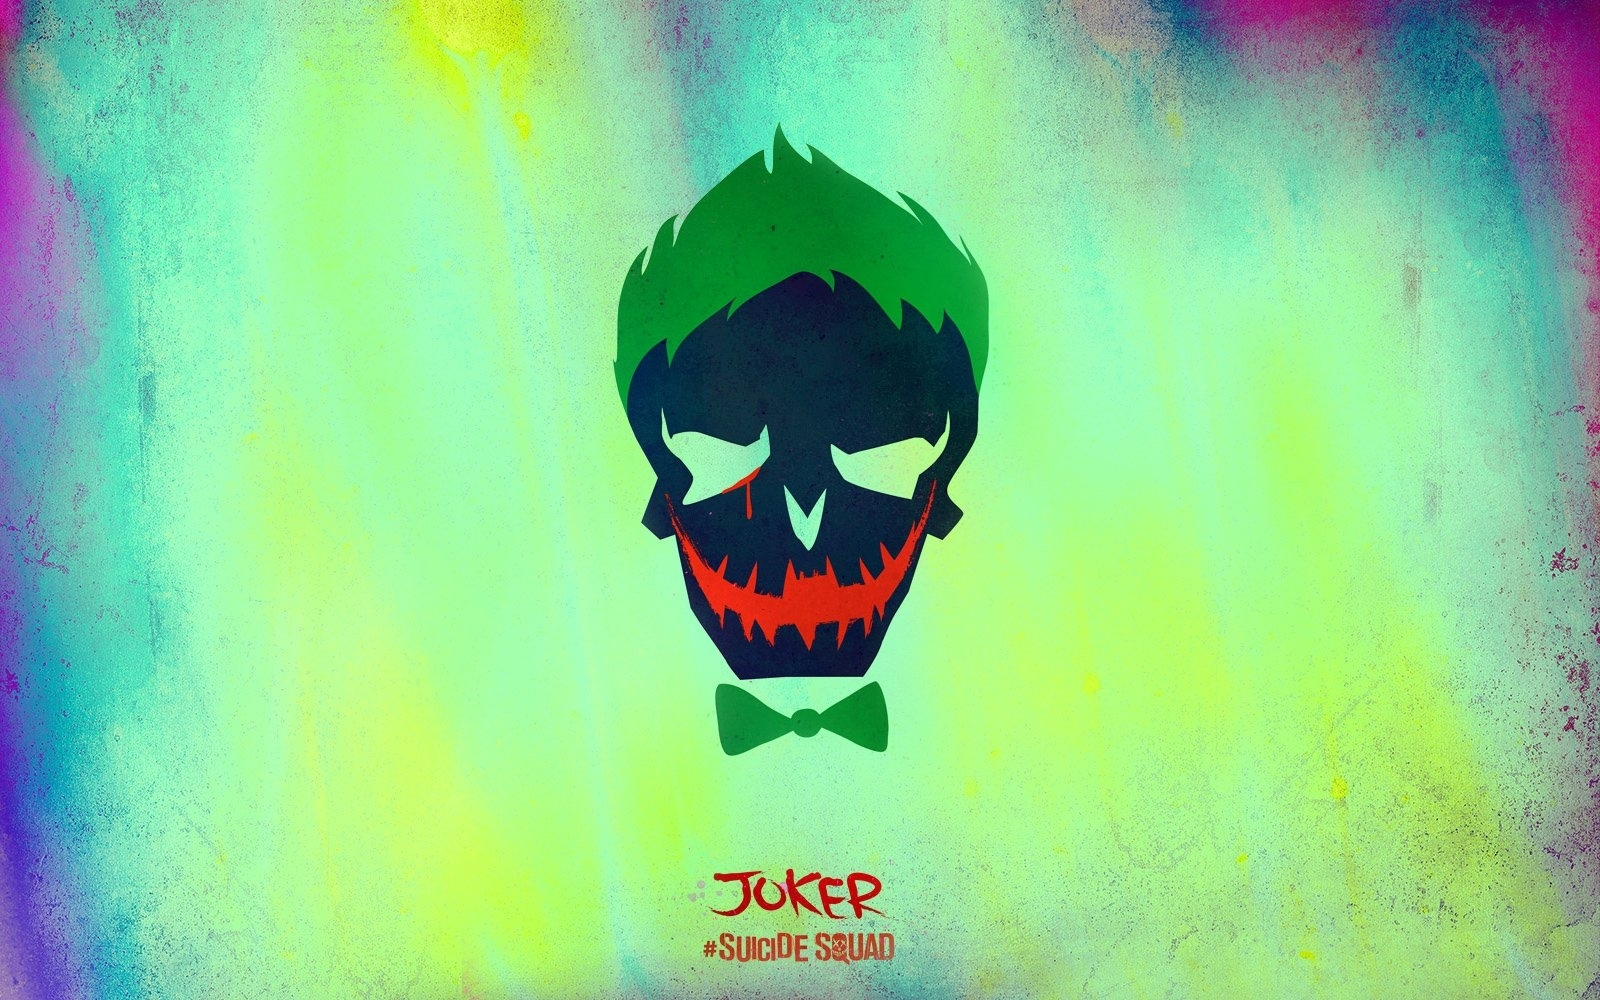 the joker fond d'écran and arrière-plan | 1600x1000 | id:705680